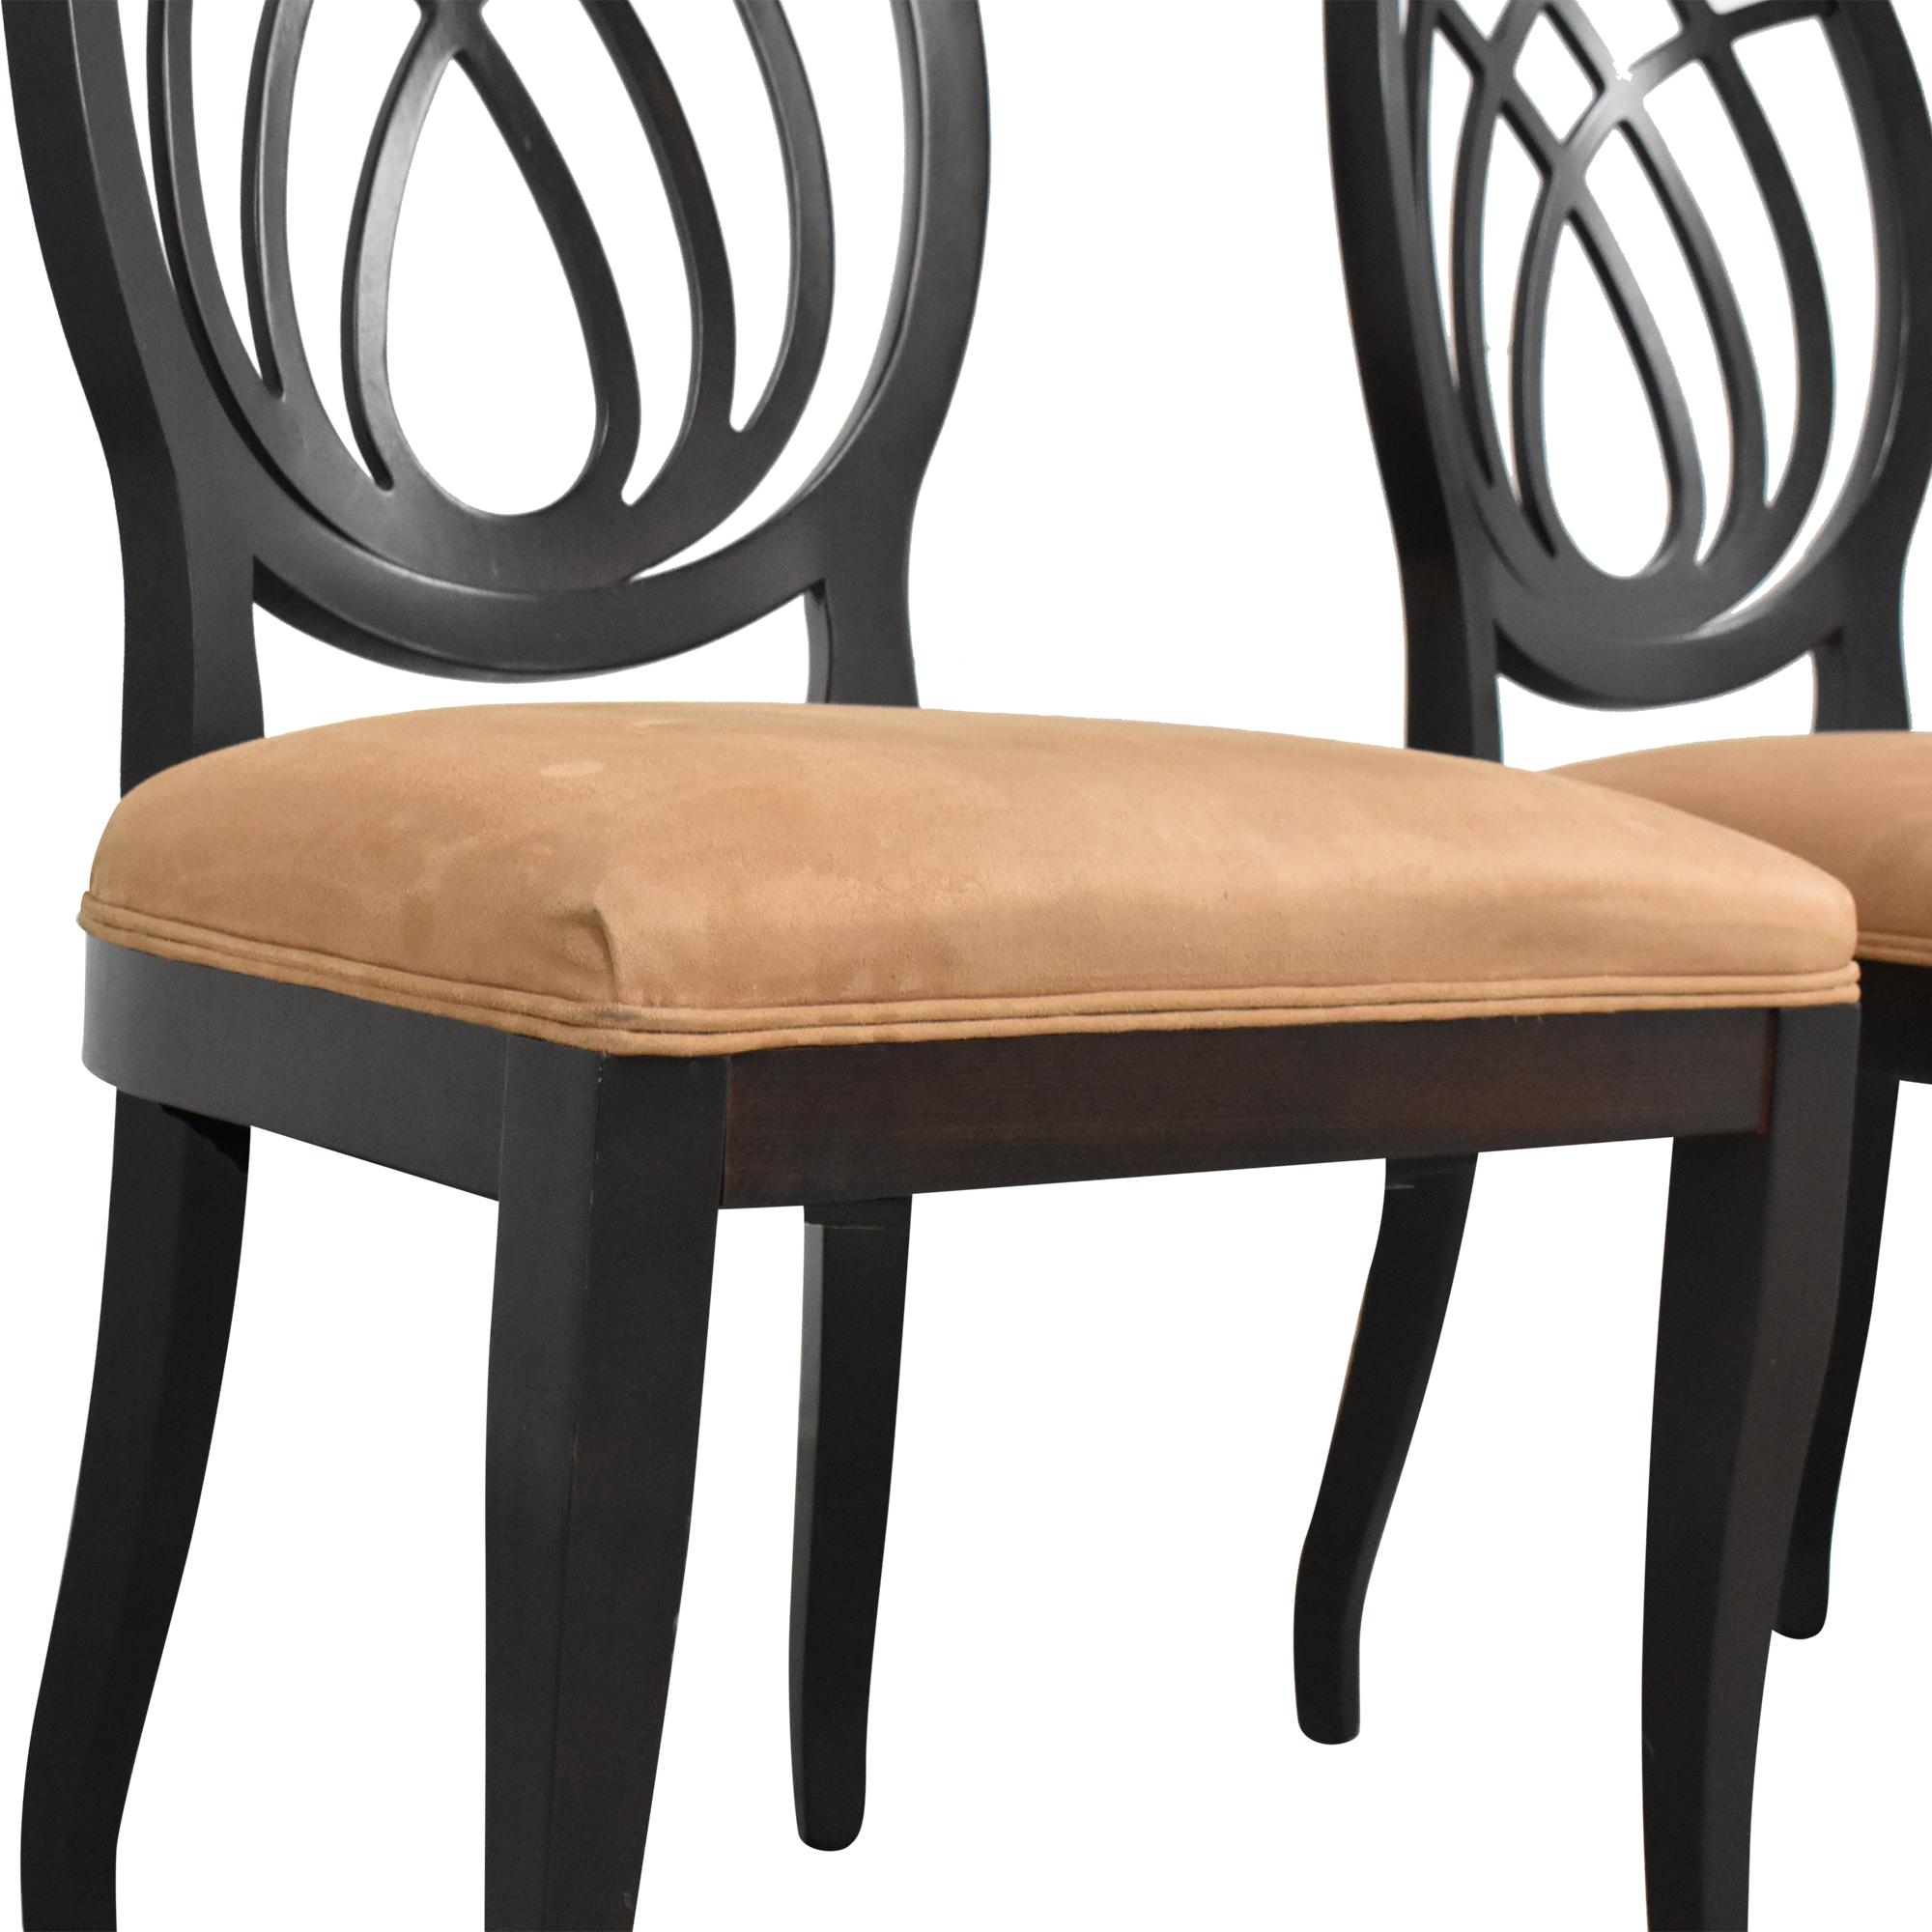 Bombay Company Bombay Company Oval Back Dining Side Chairs